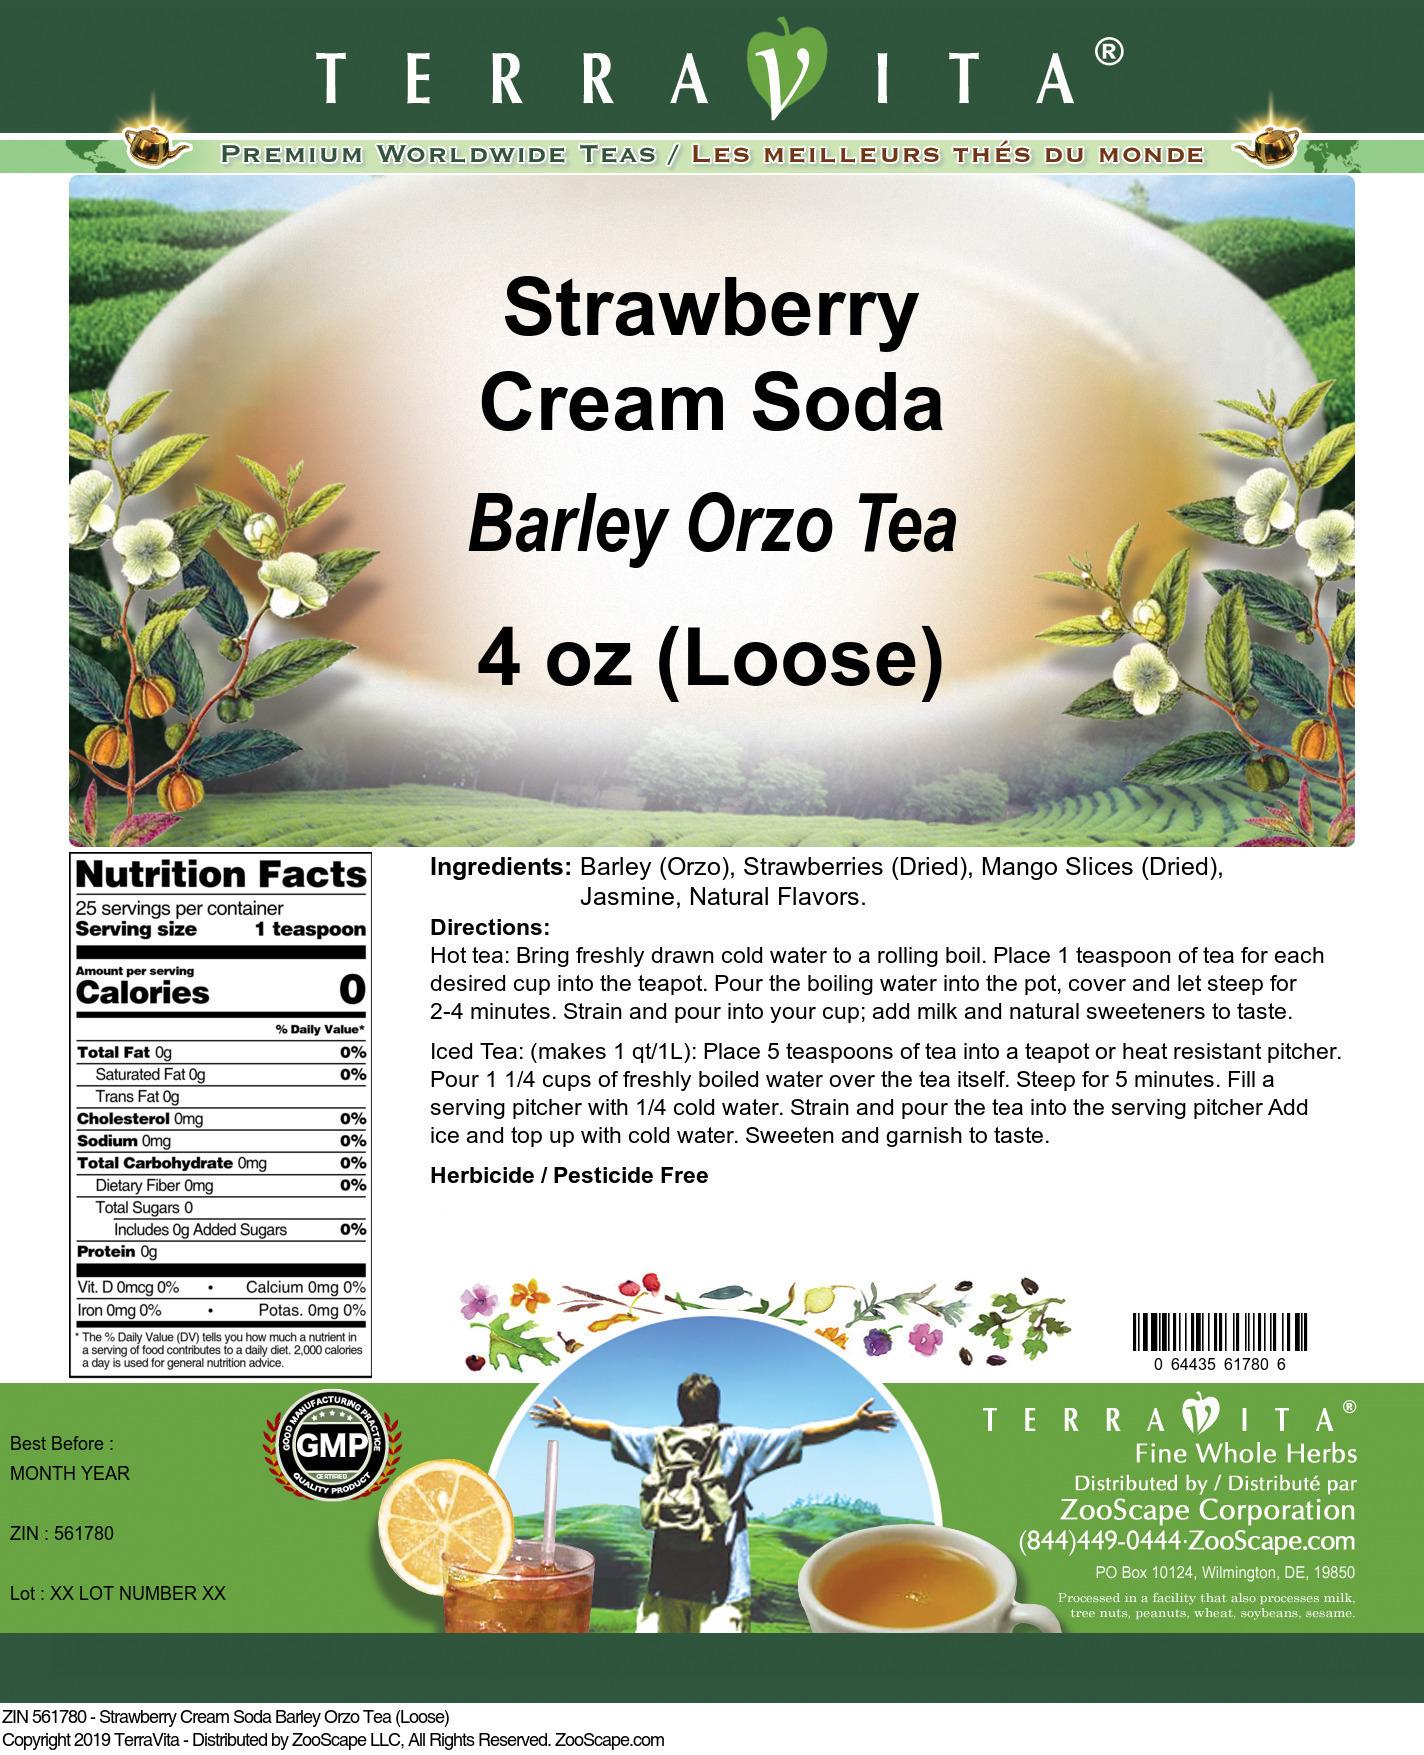 Strawberry Cream Soda Barley Orzo